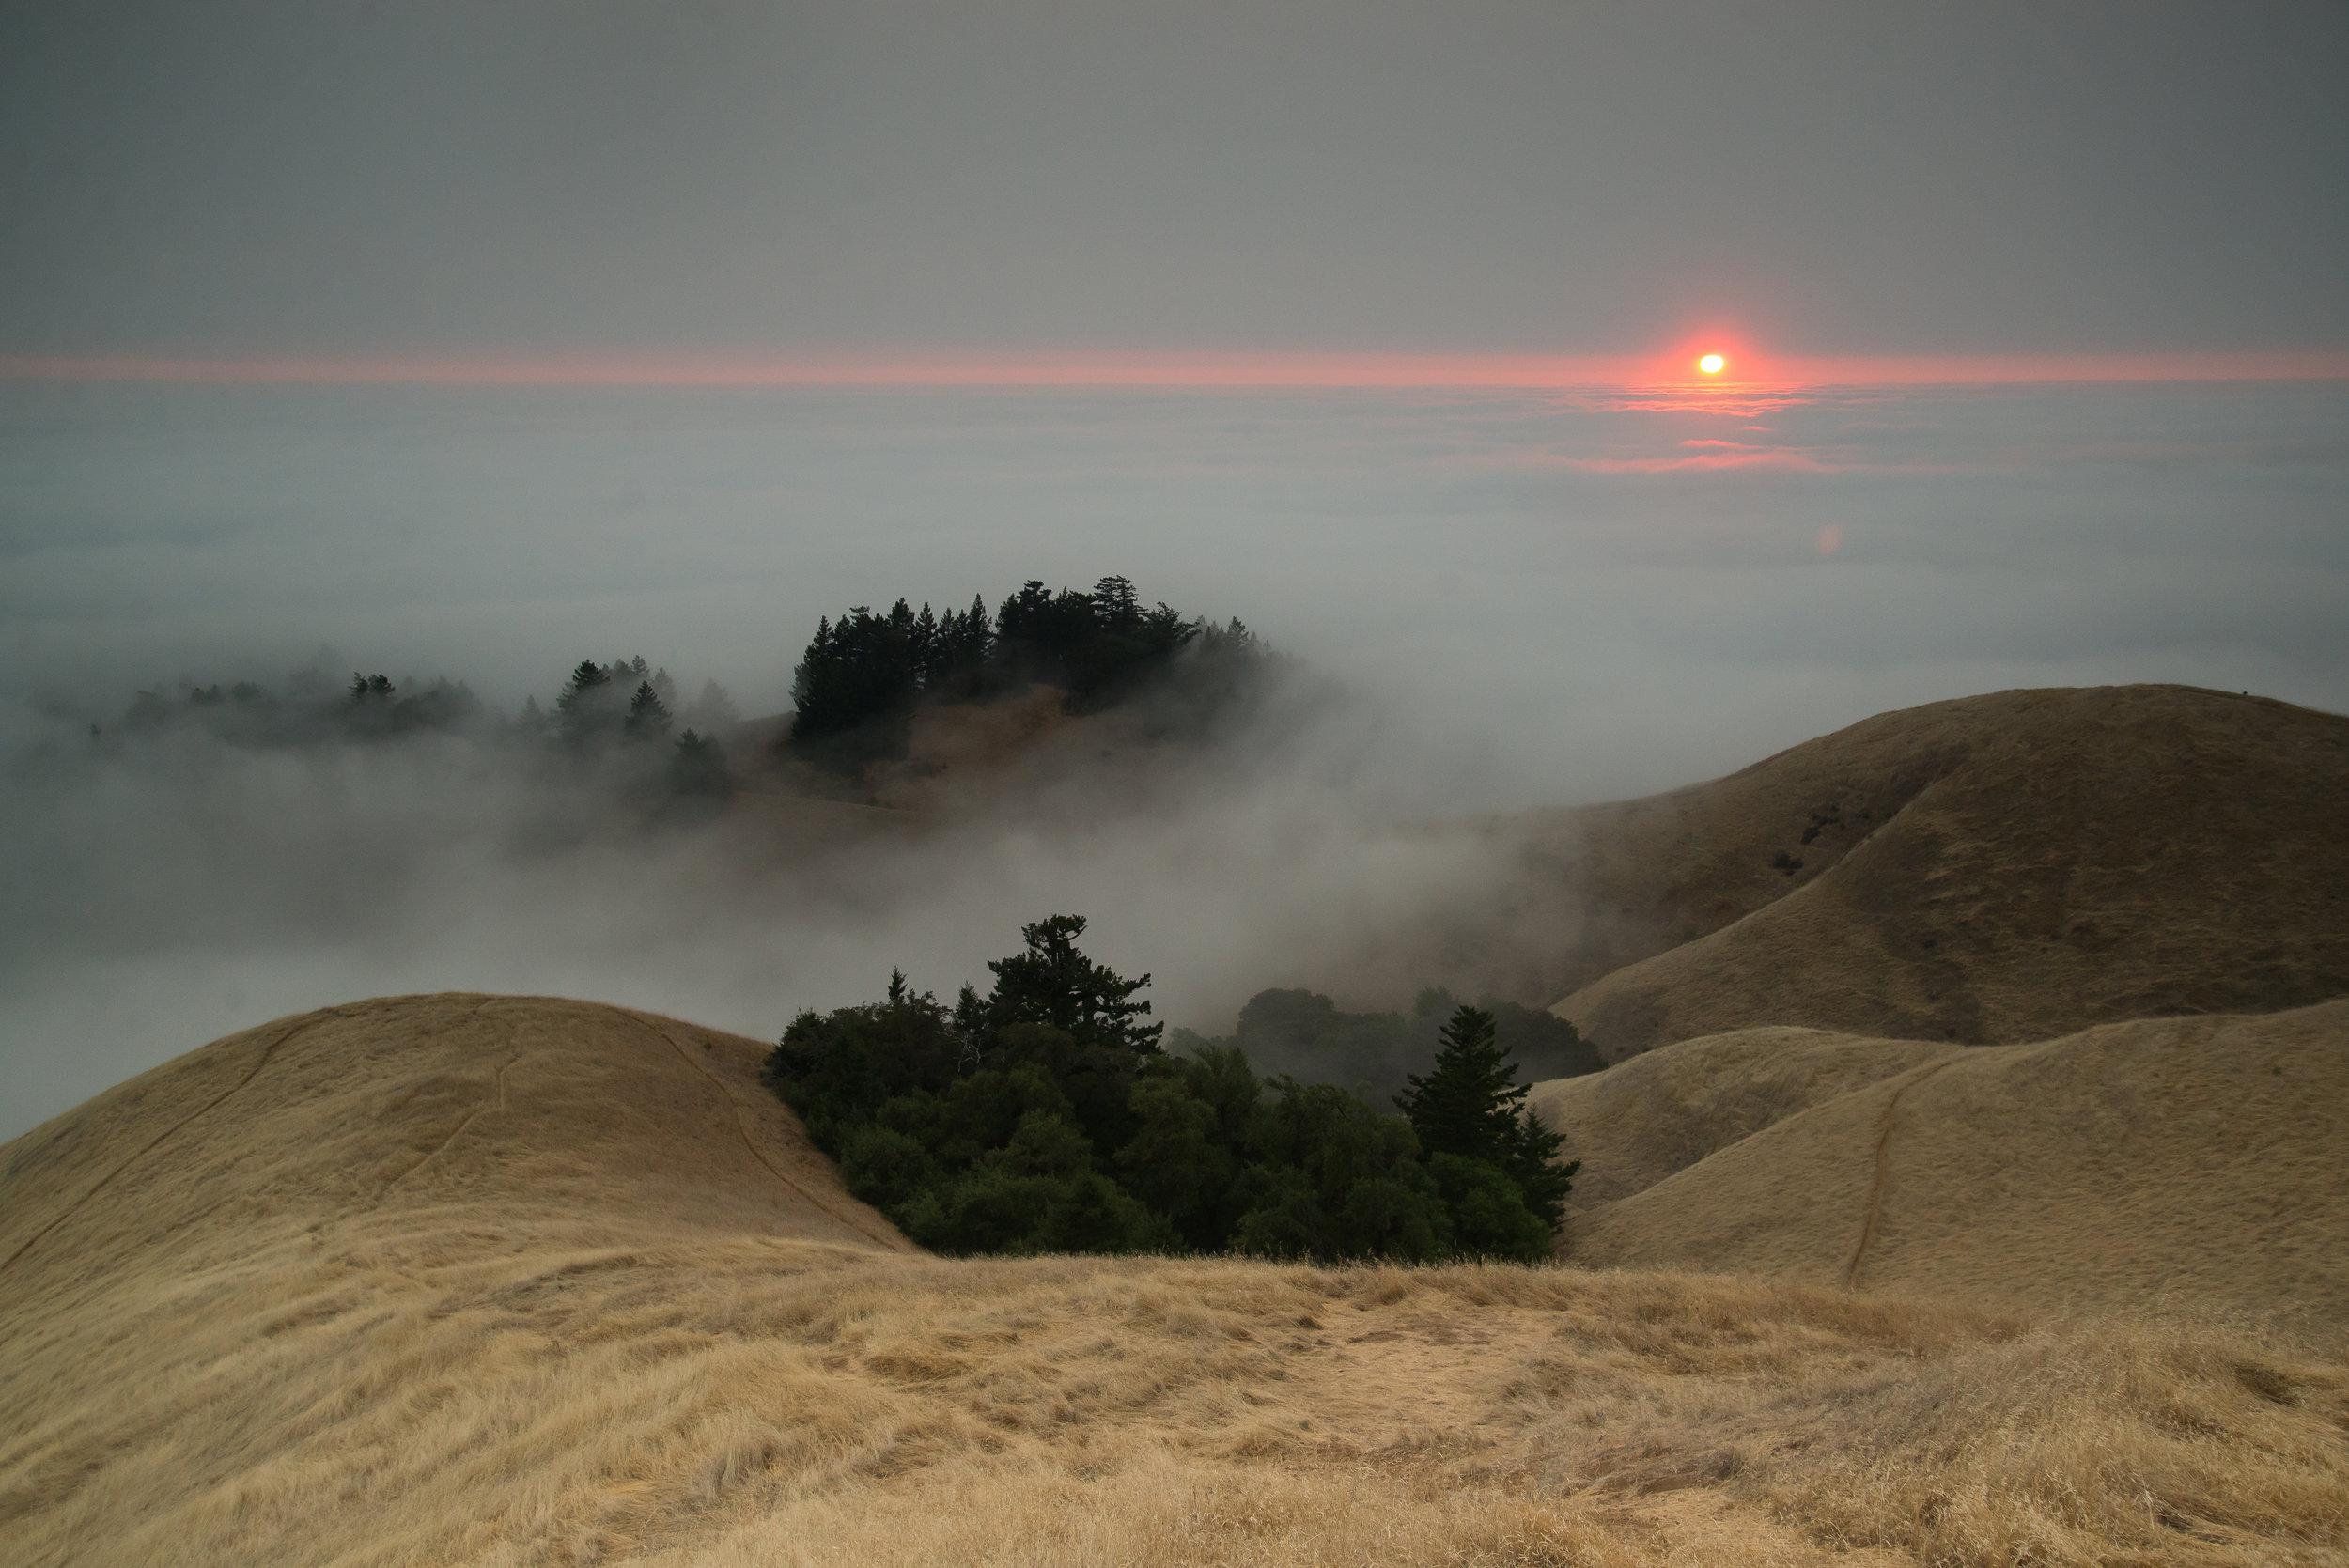 18-08-24-Tam-sunset-1-1069.jpg